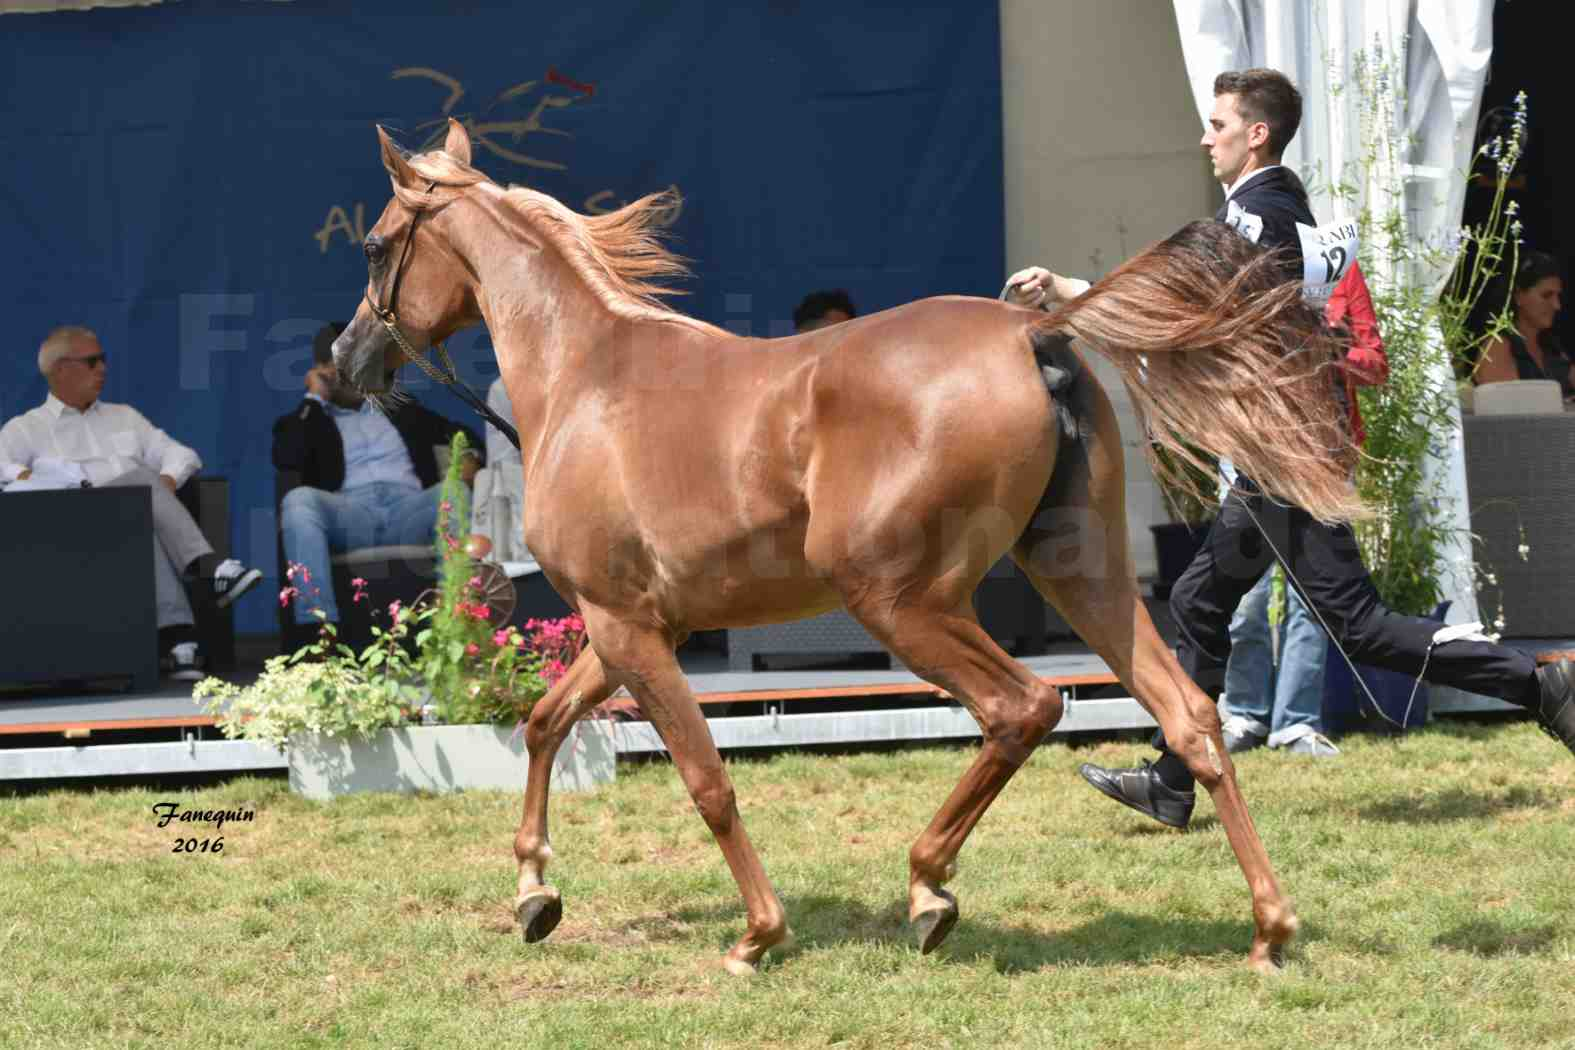 International Arabian Horse Show B de VICHY 2016 - JA FALAENE - Notre Sélection - 06